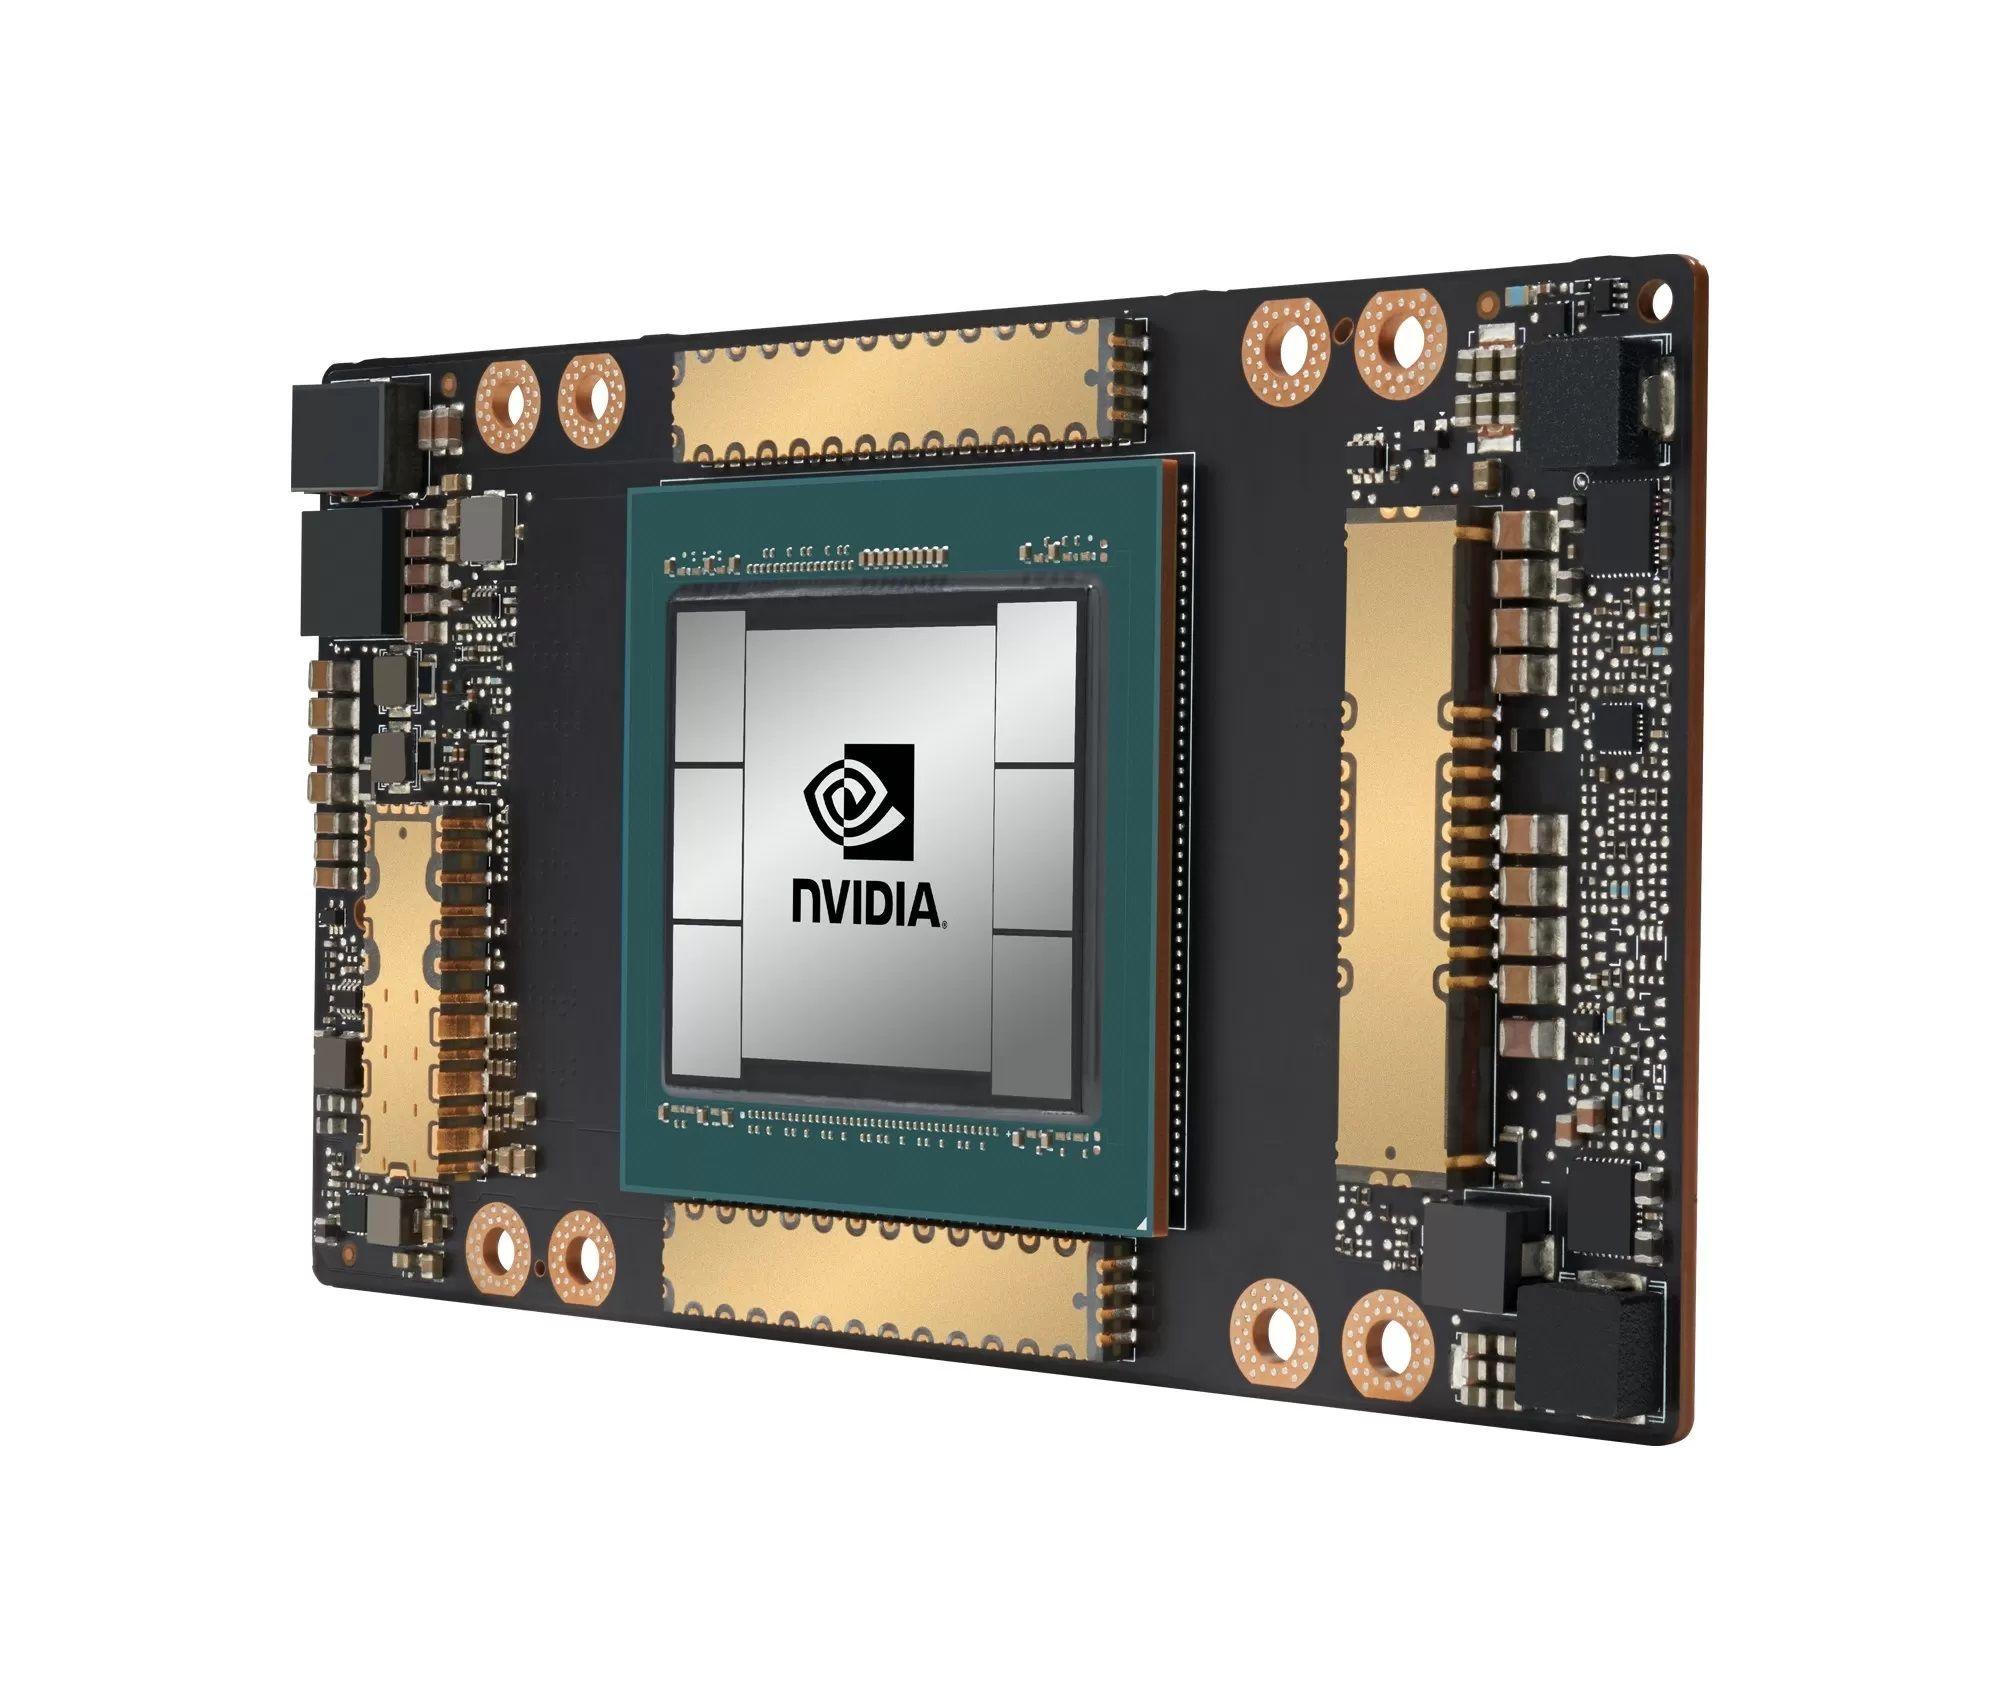 Графический процессор Nvidia GA100 с кэшем L1 20 Мб и L2 40 Мб